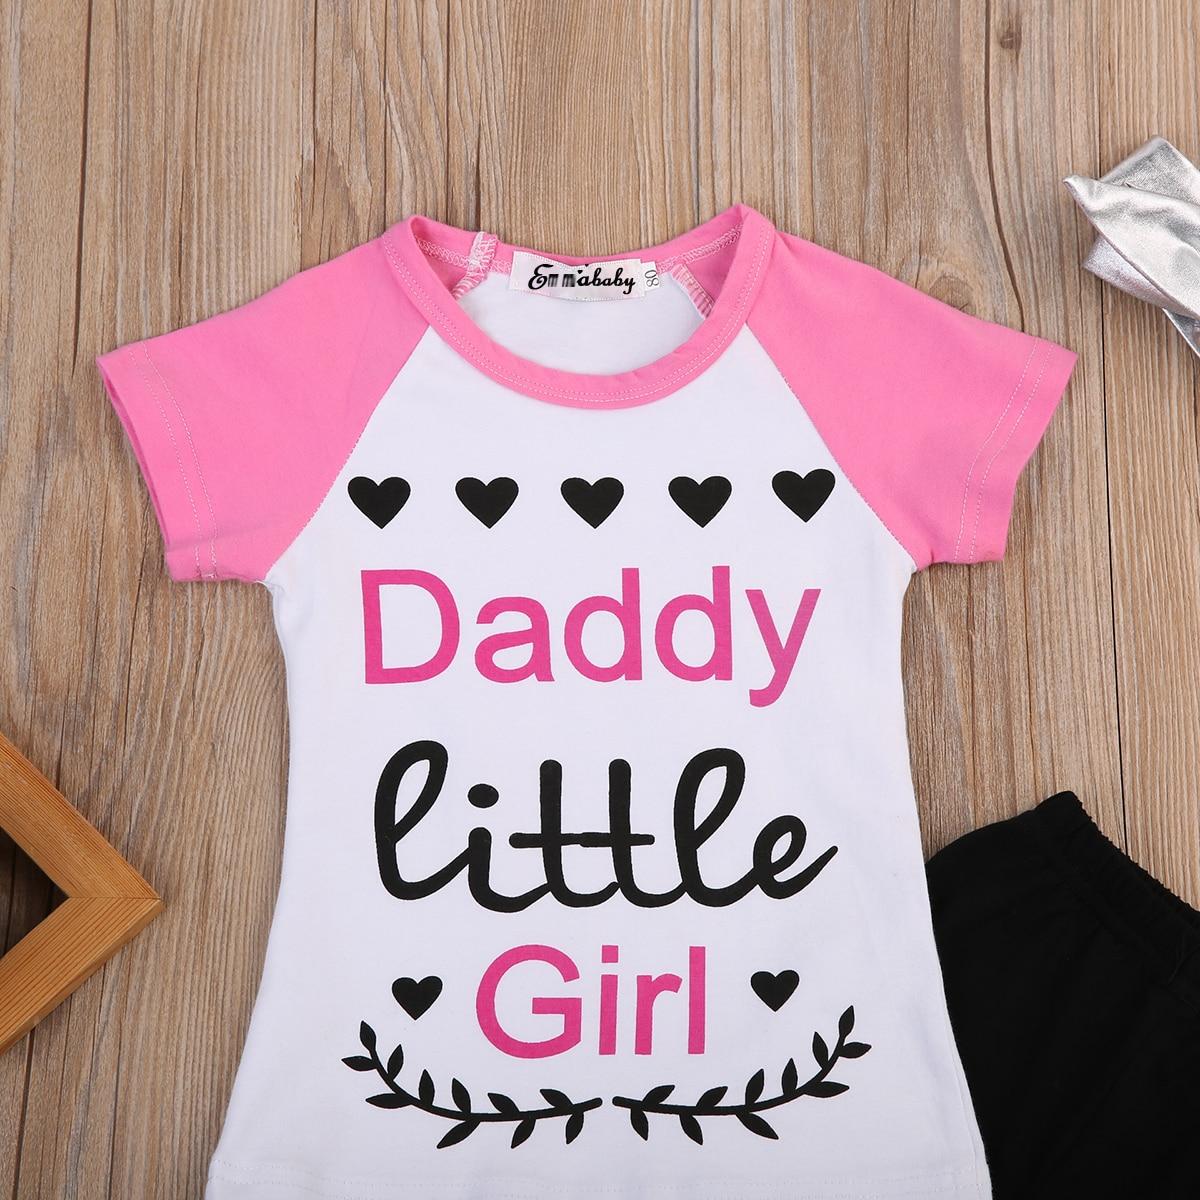 a711d5c24 2017 Summer New Children Daddy Little Girl Clothing Boutique Kids Girls  Graphic Tee T shirt Pants